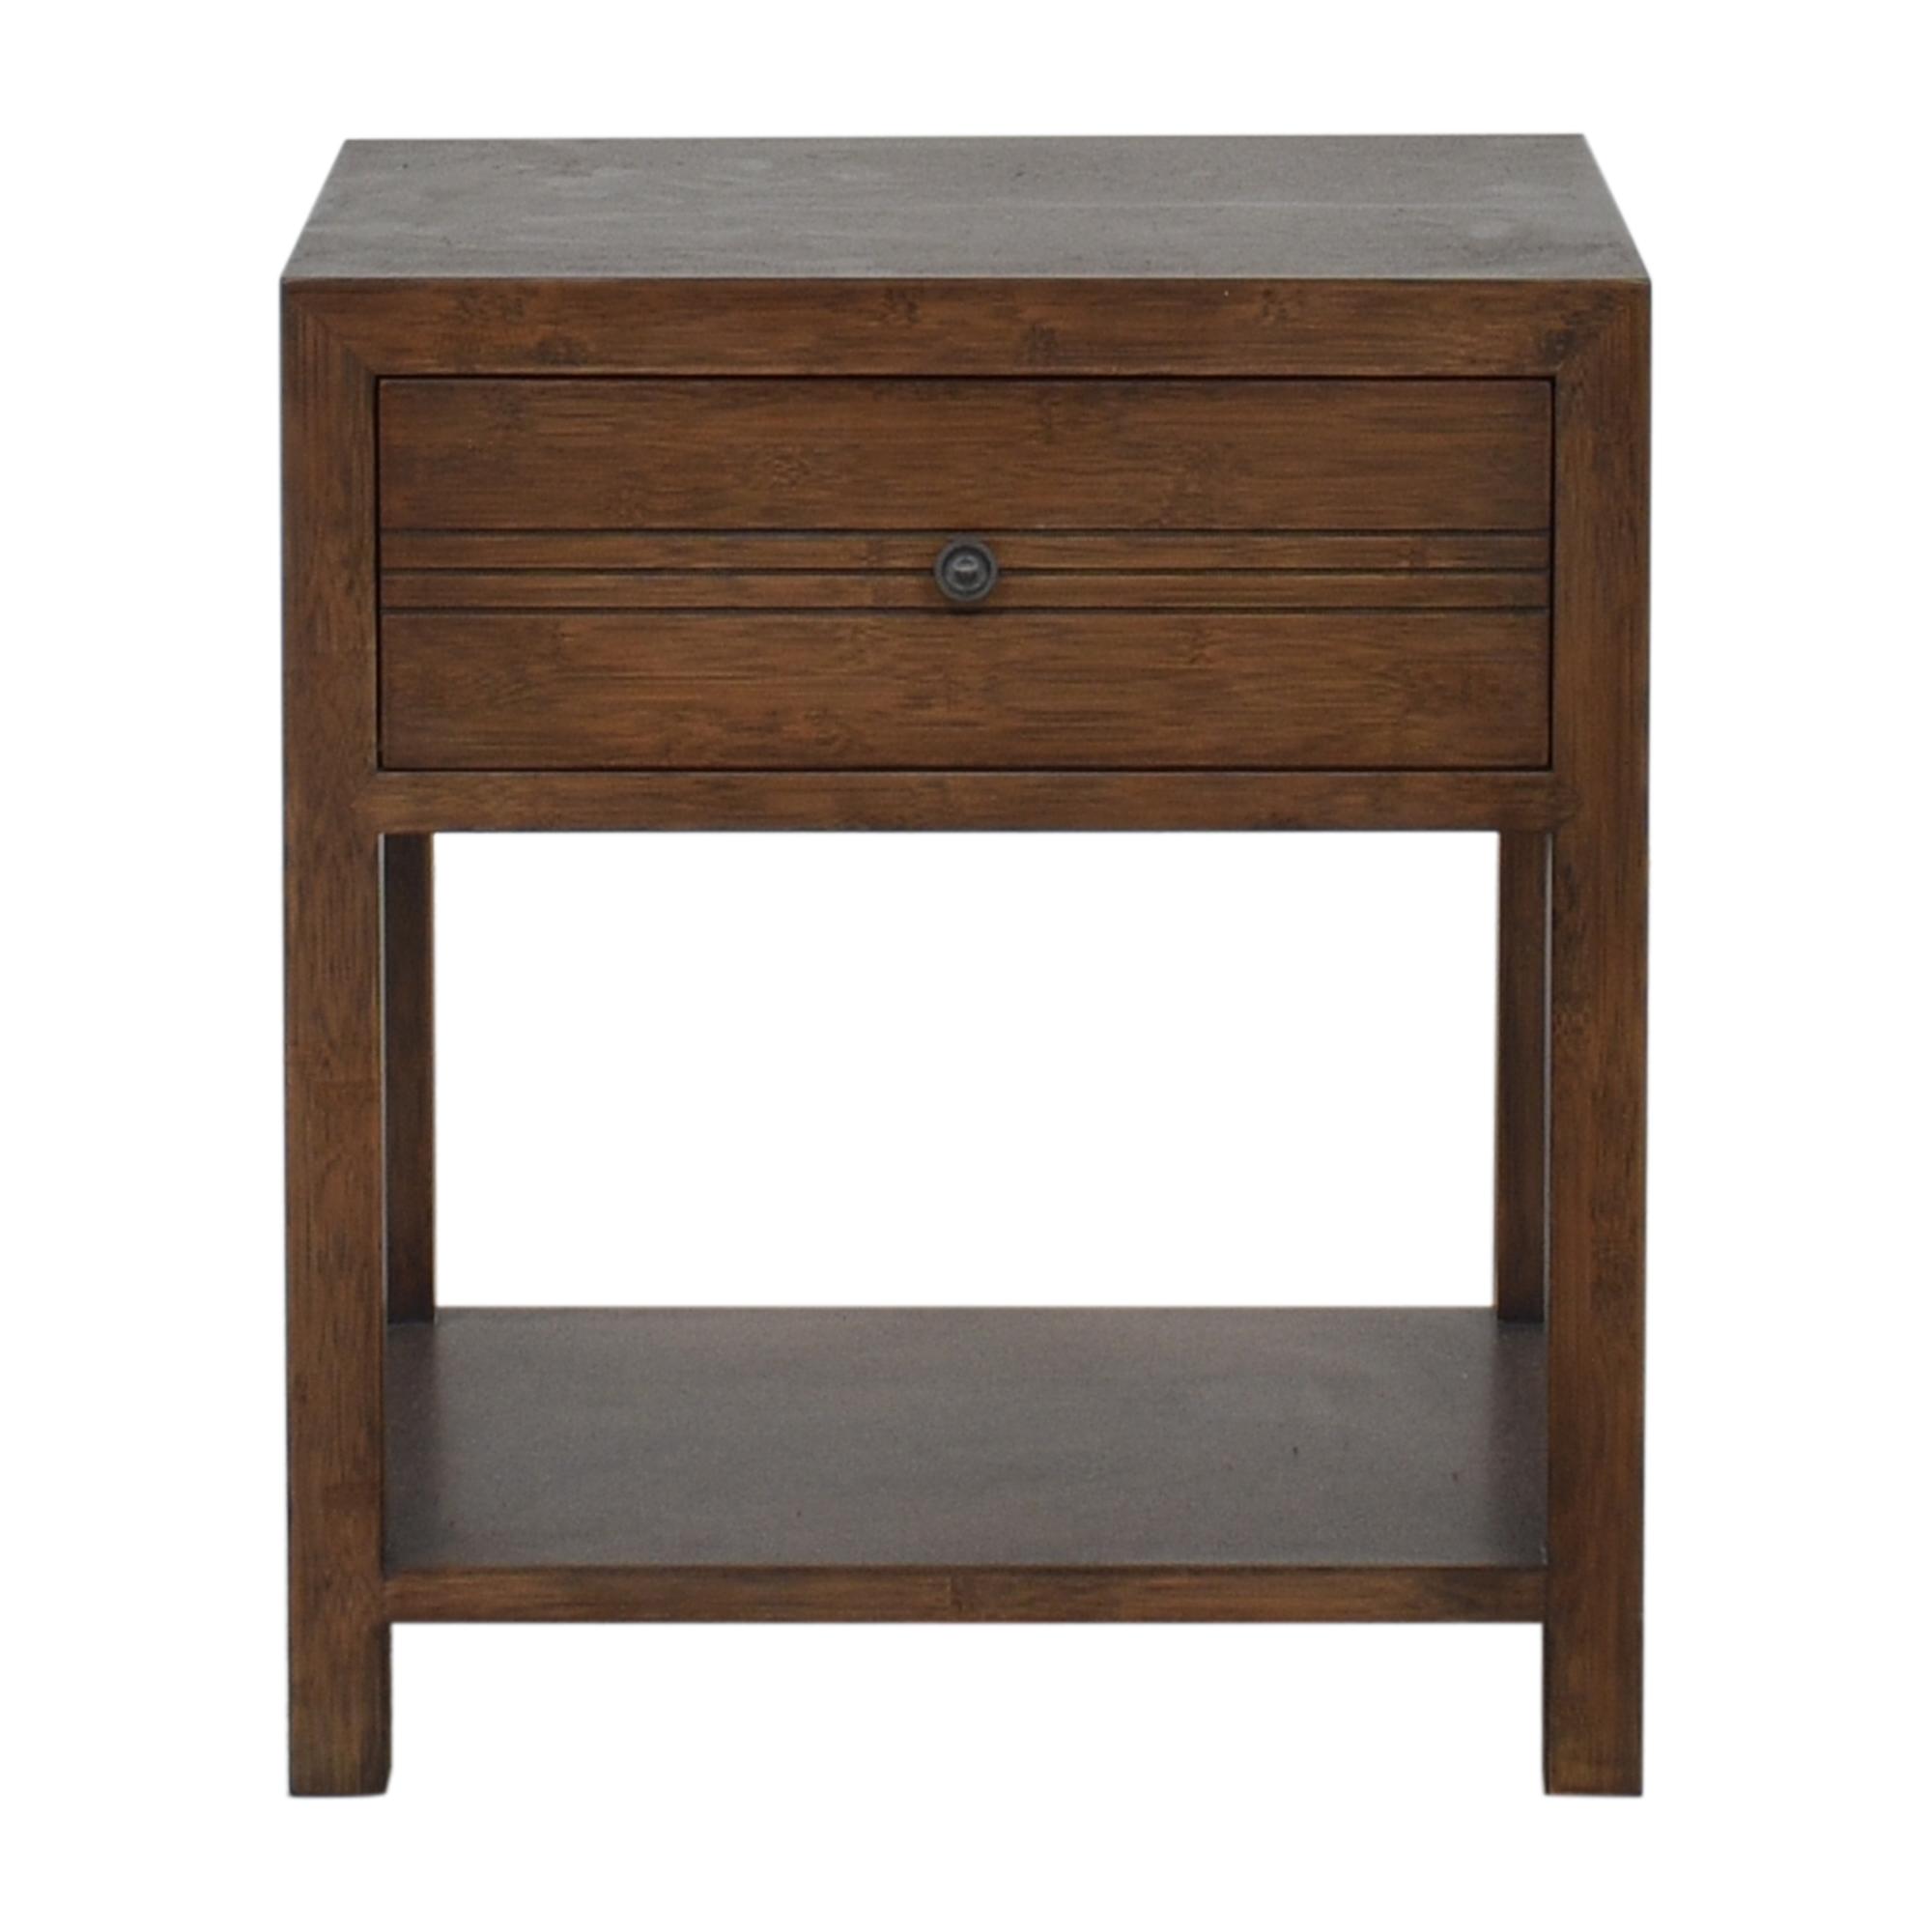 Crate & Barrel Maria Yee Single Drawer Nightstand sale